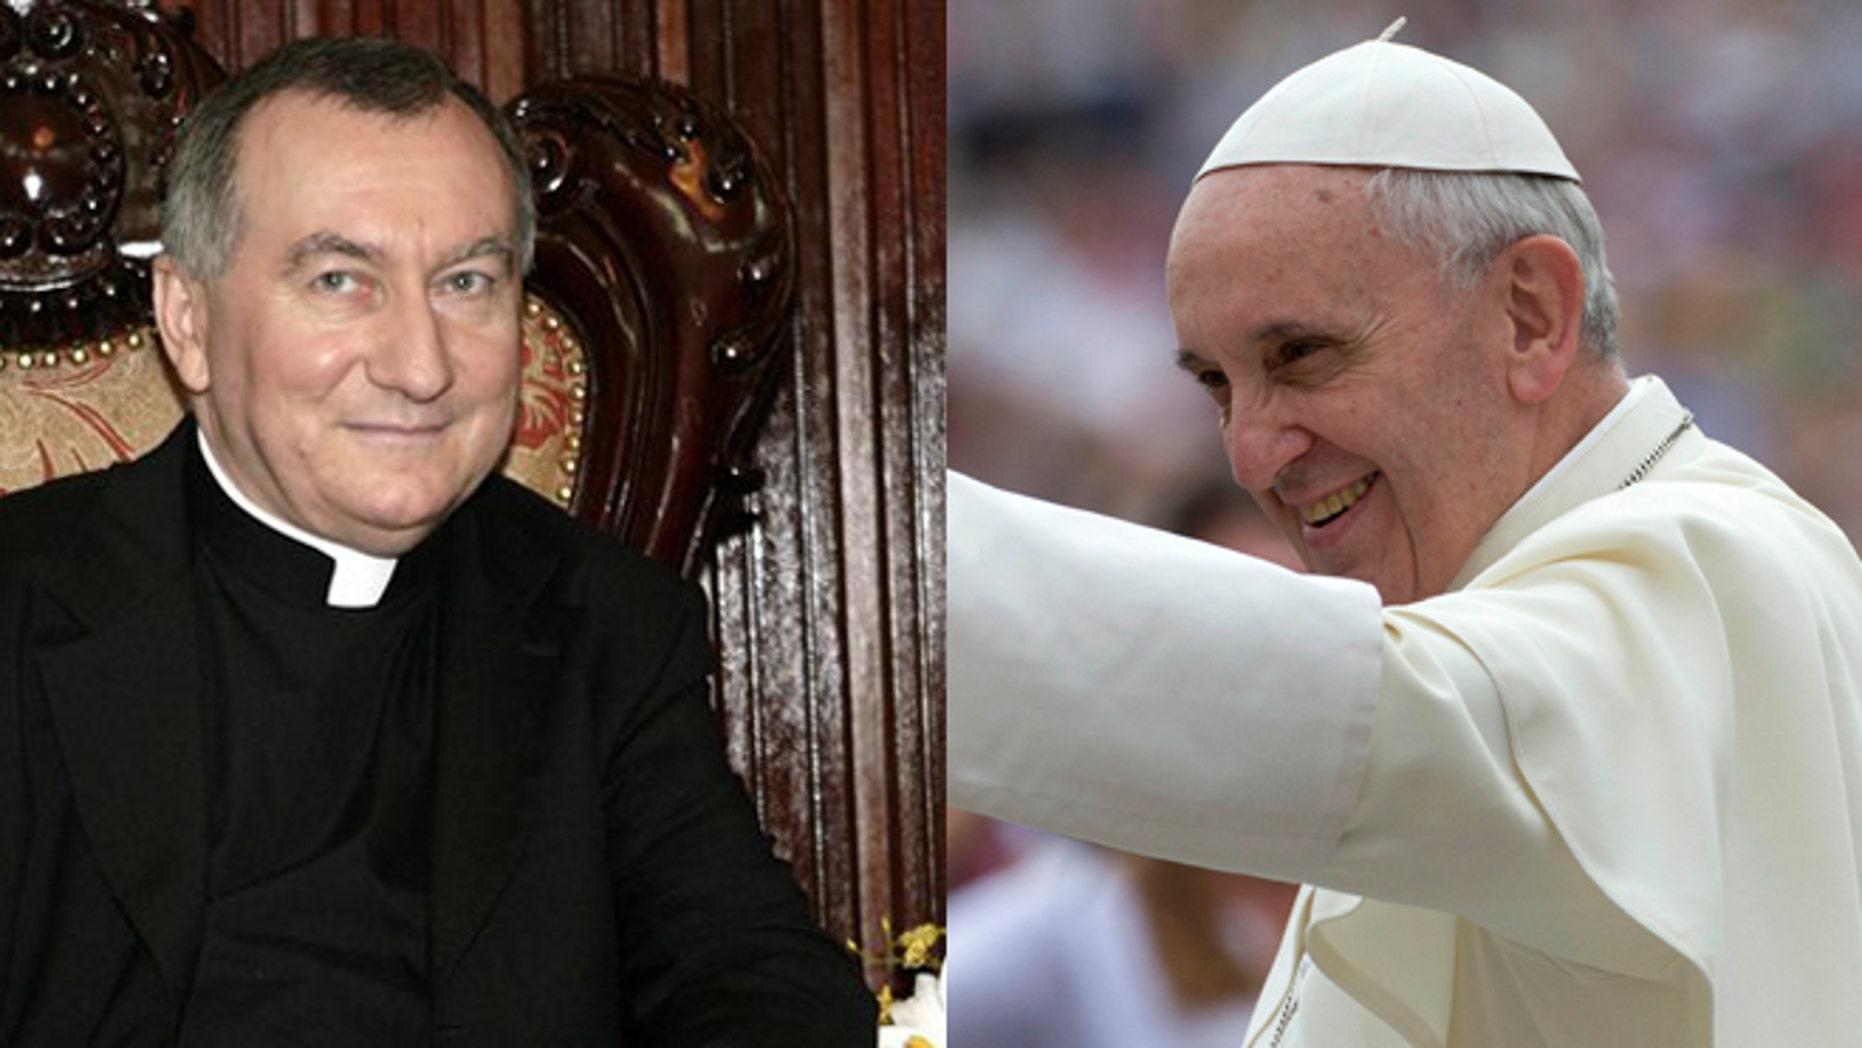 Vatican's Secretary of State Pietro Parolin (left) and Pope Francis (right).